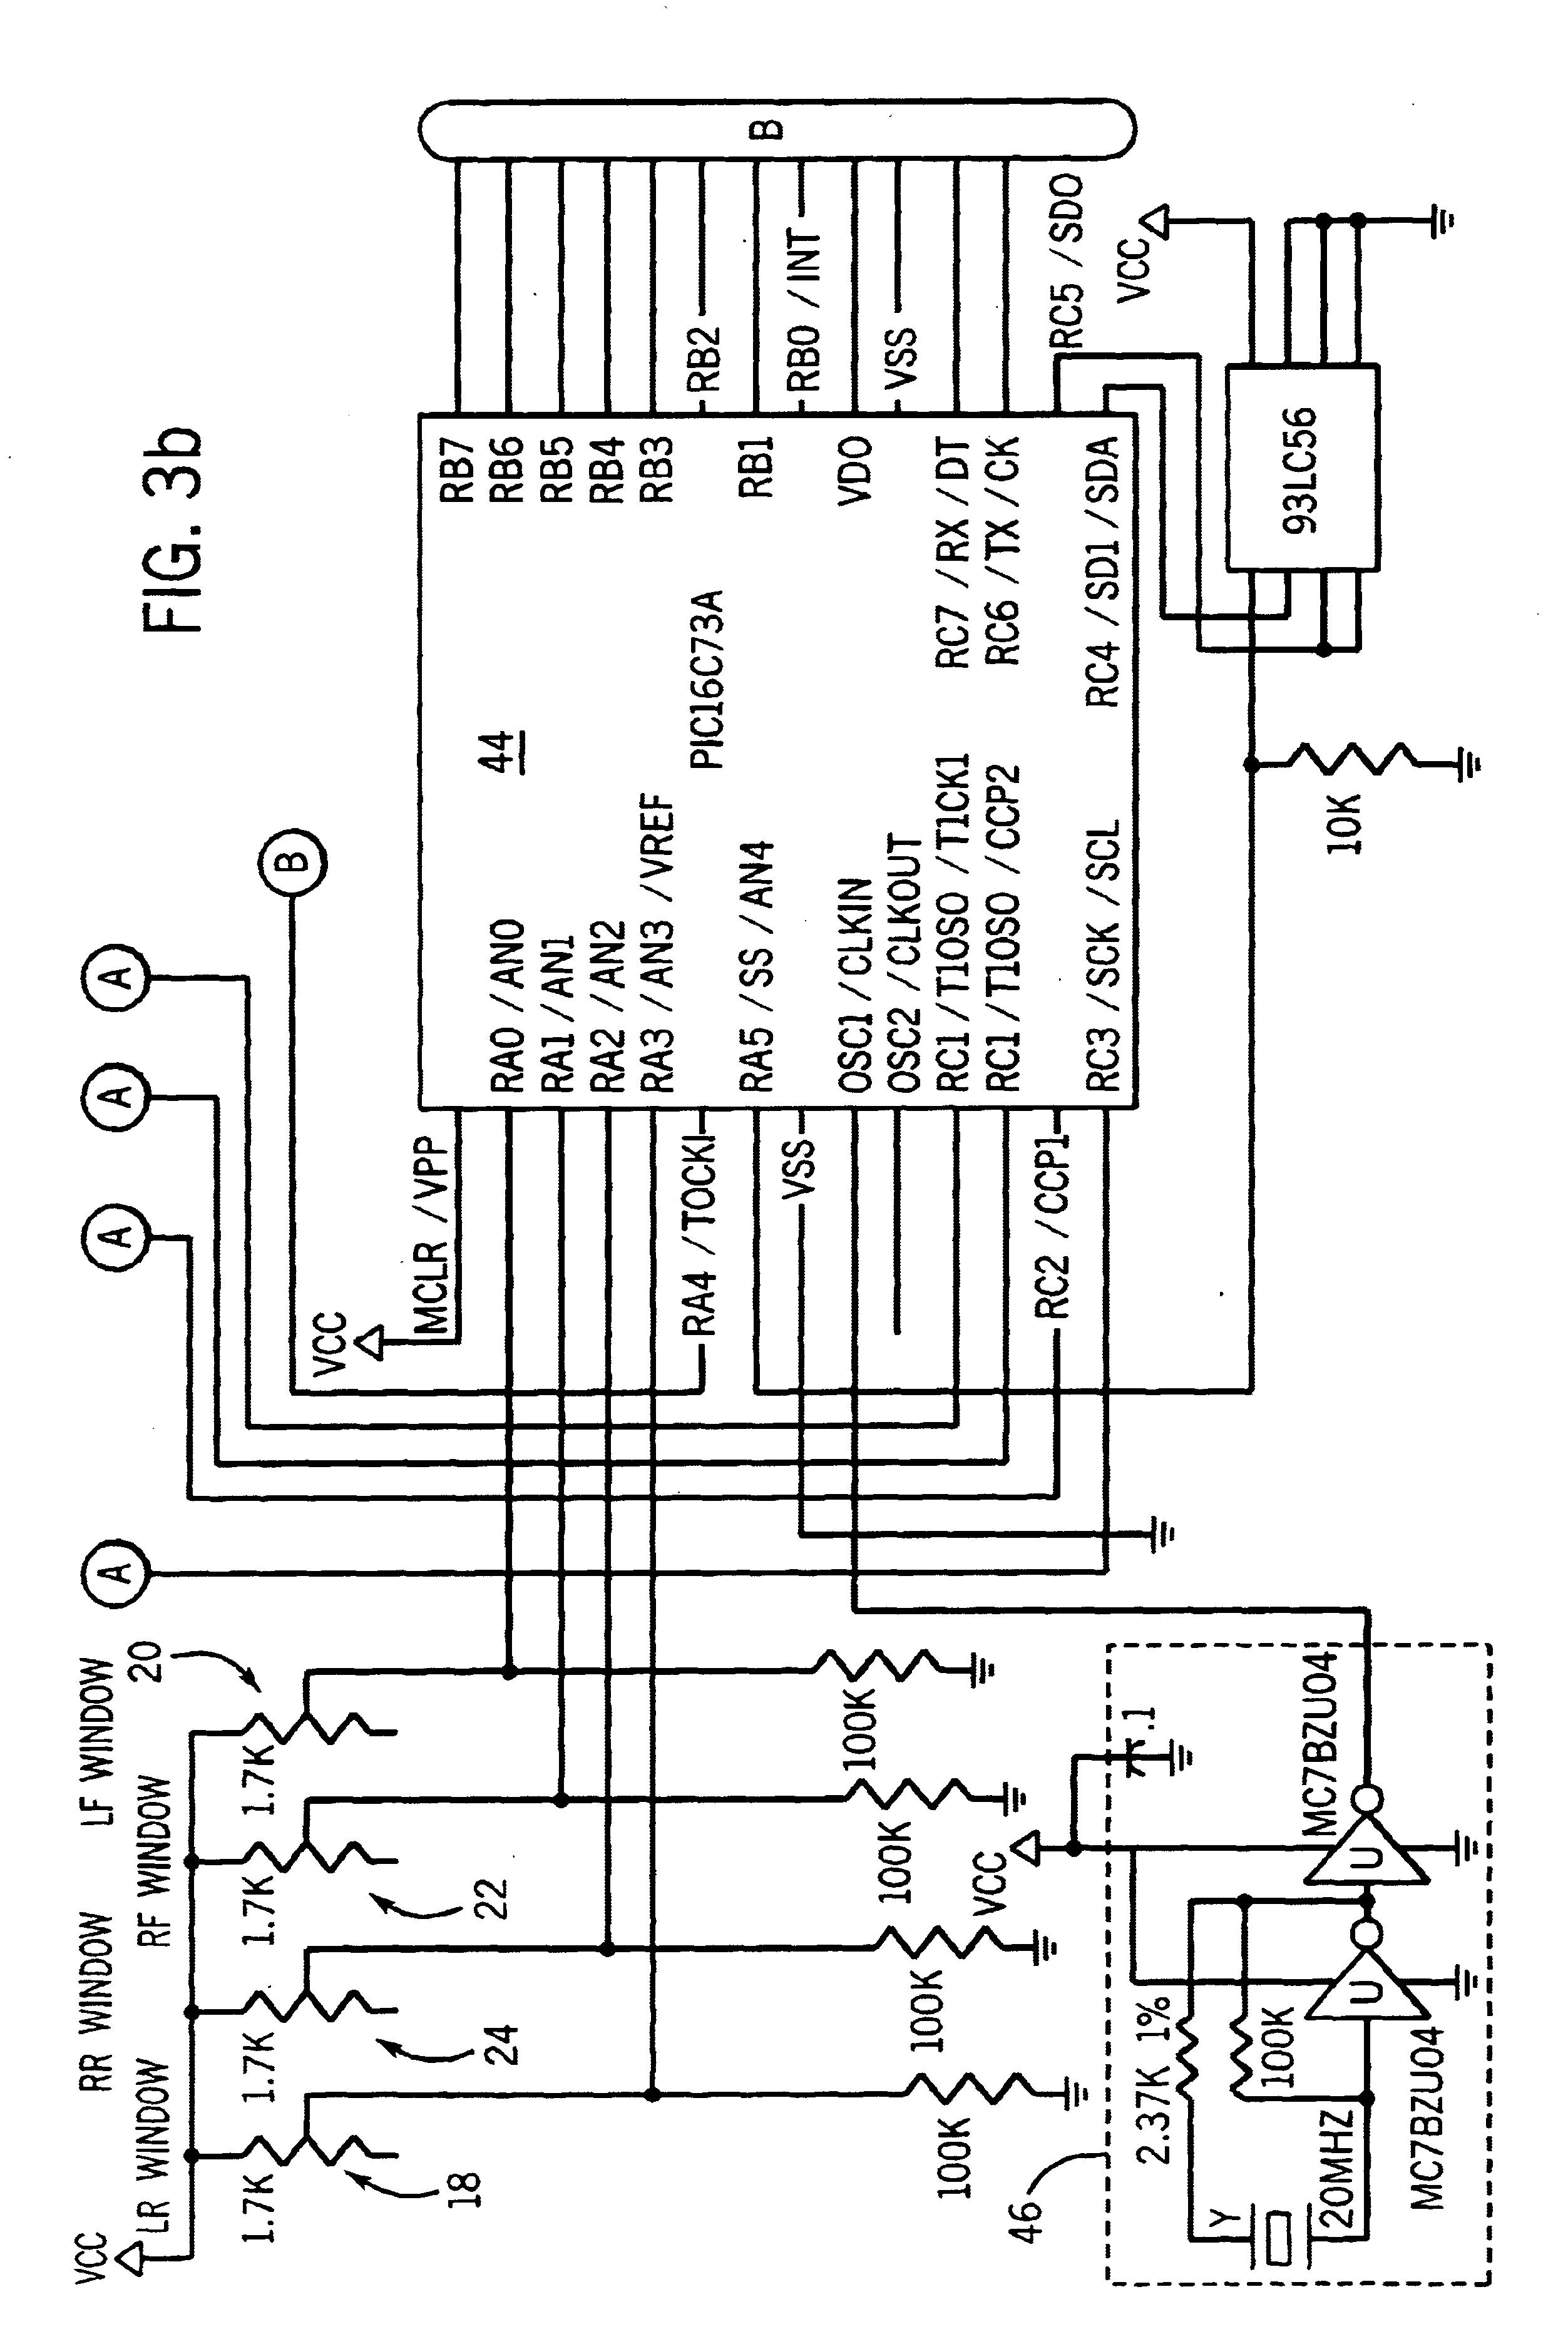 Patent Us6657316 - Window Control Apparatus